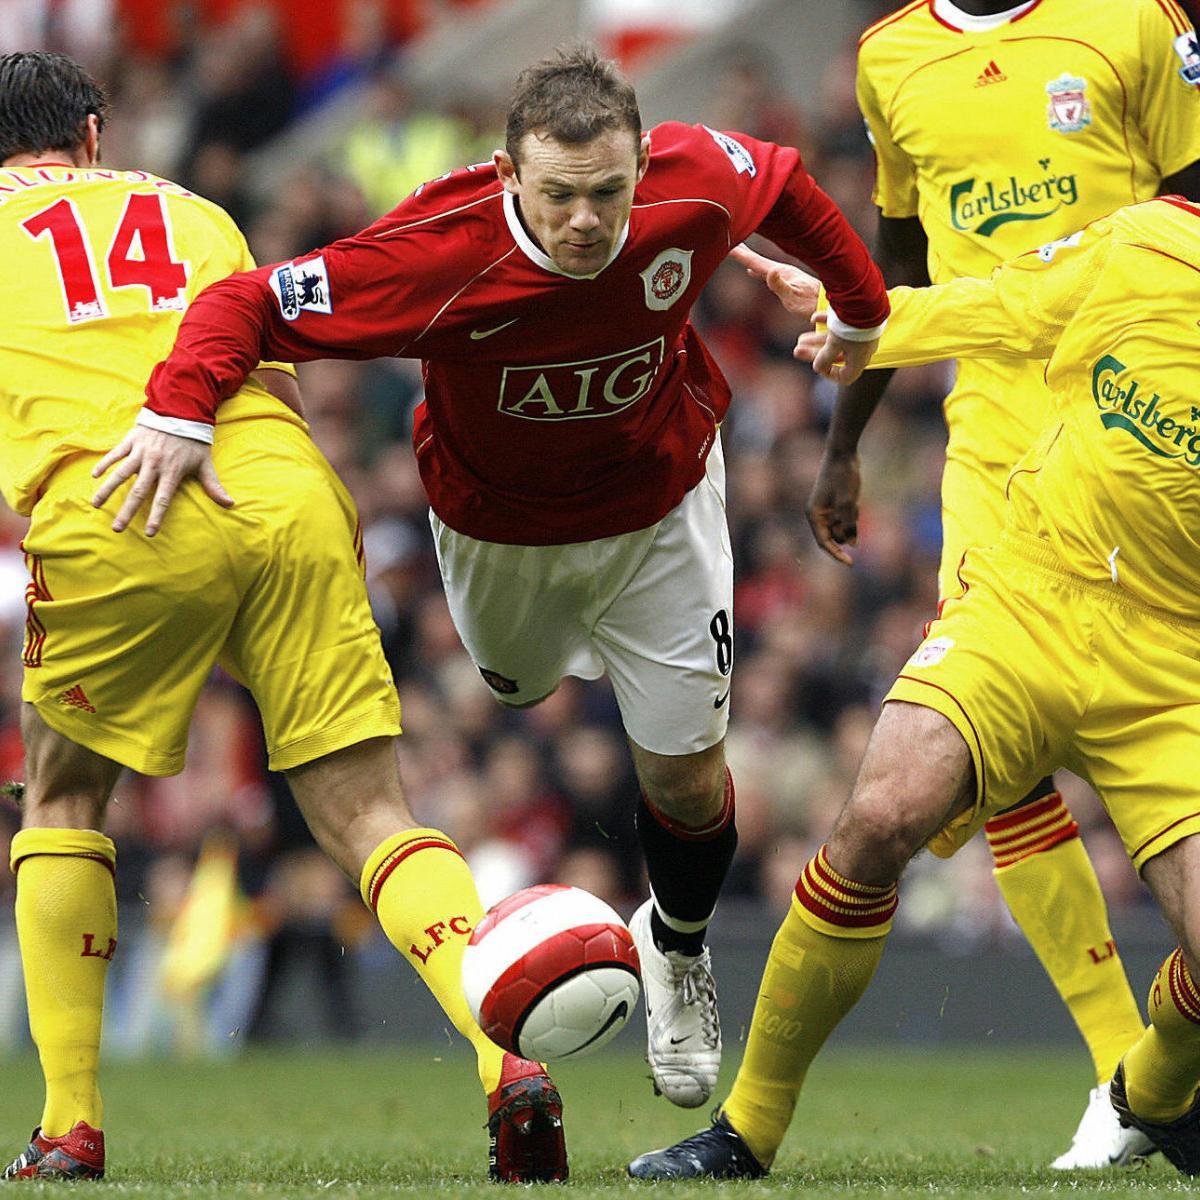 Liverpool Vs Man Utd U19s Result: 21st-Century Derby: Best Of Liverpool Vs. Best Of